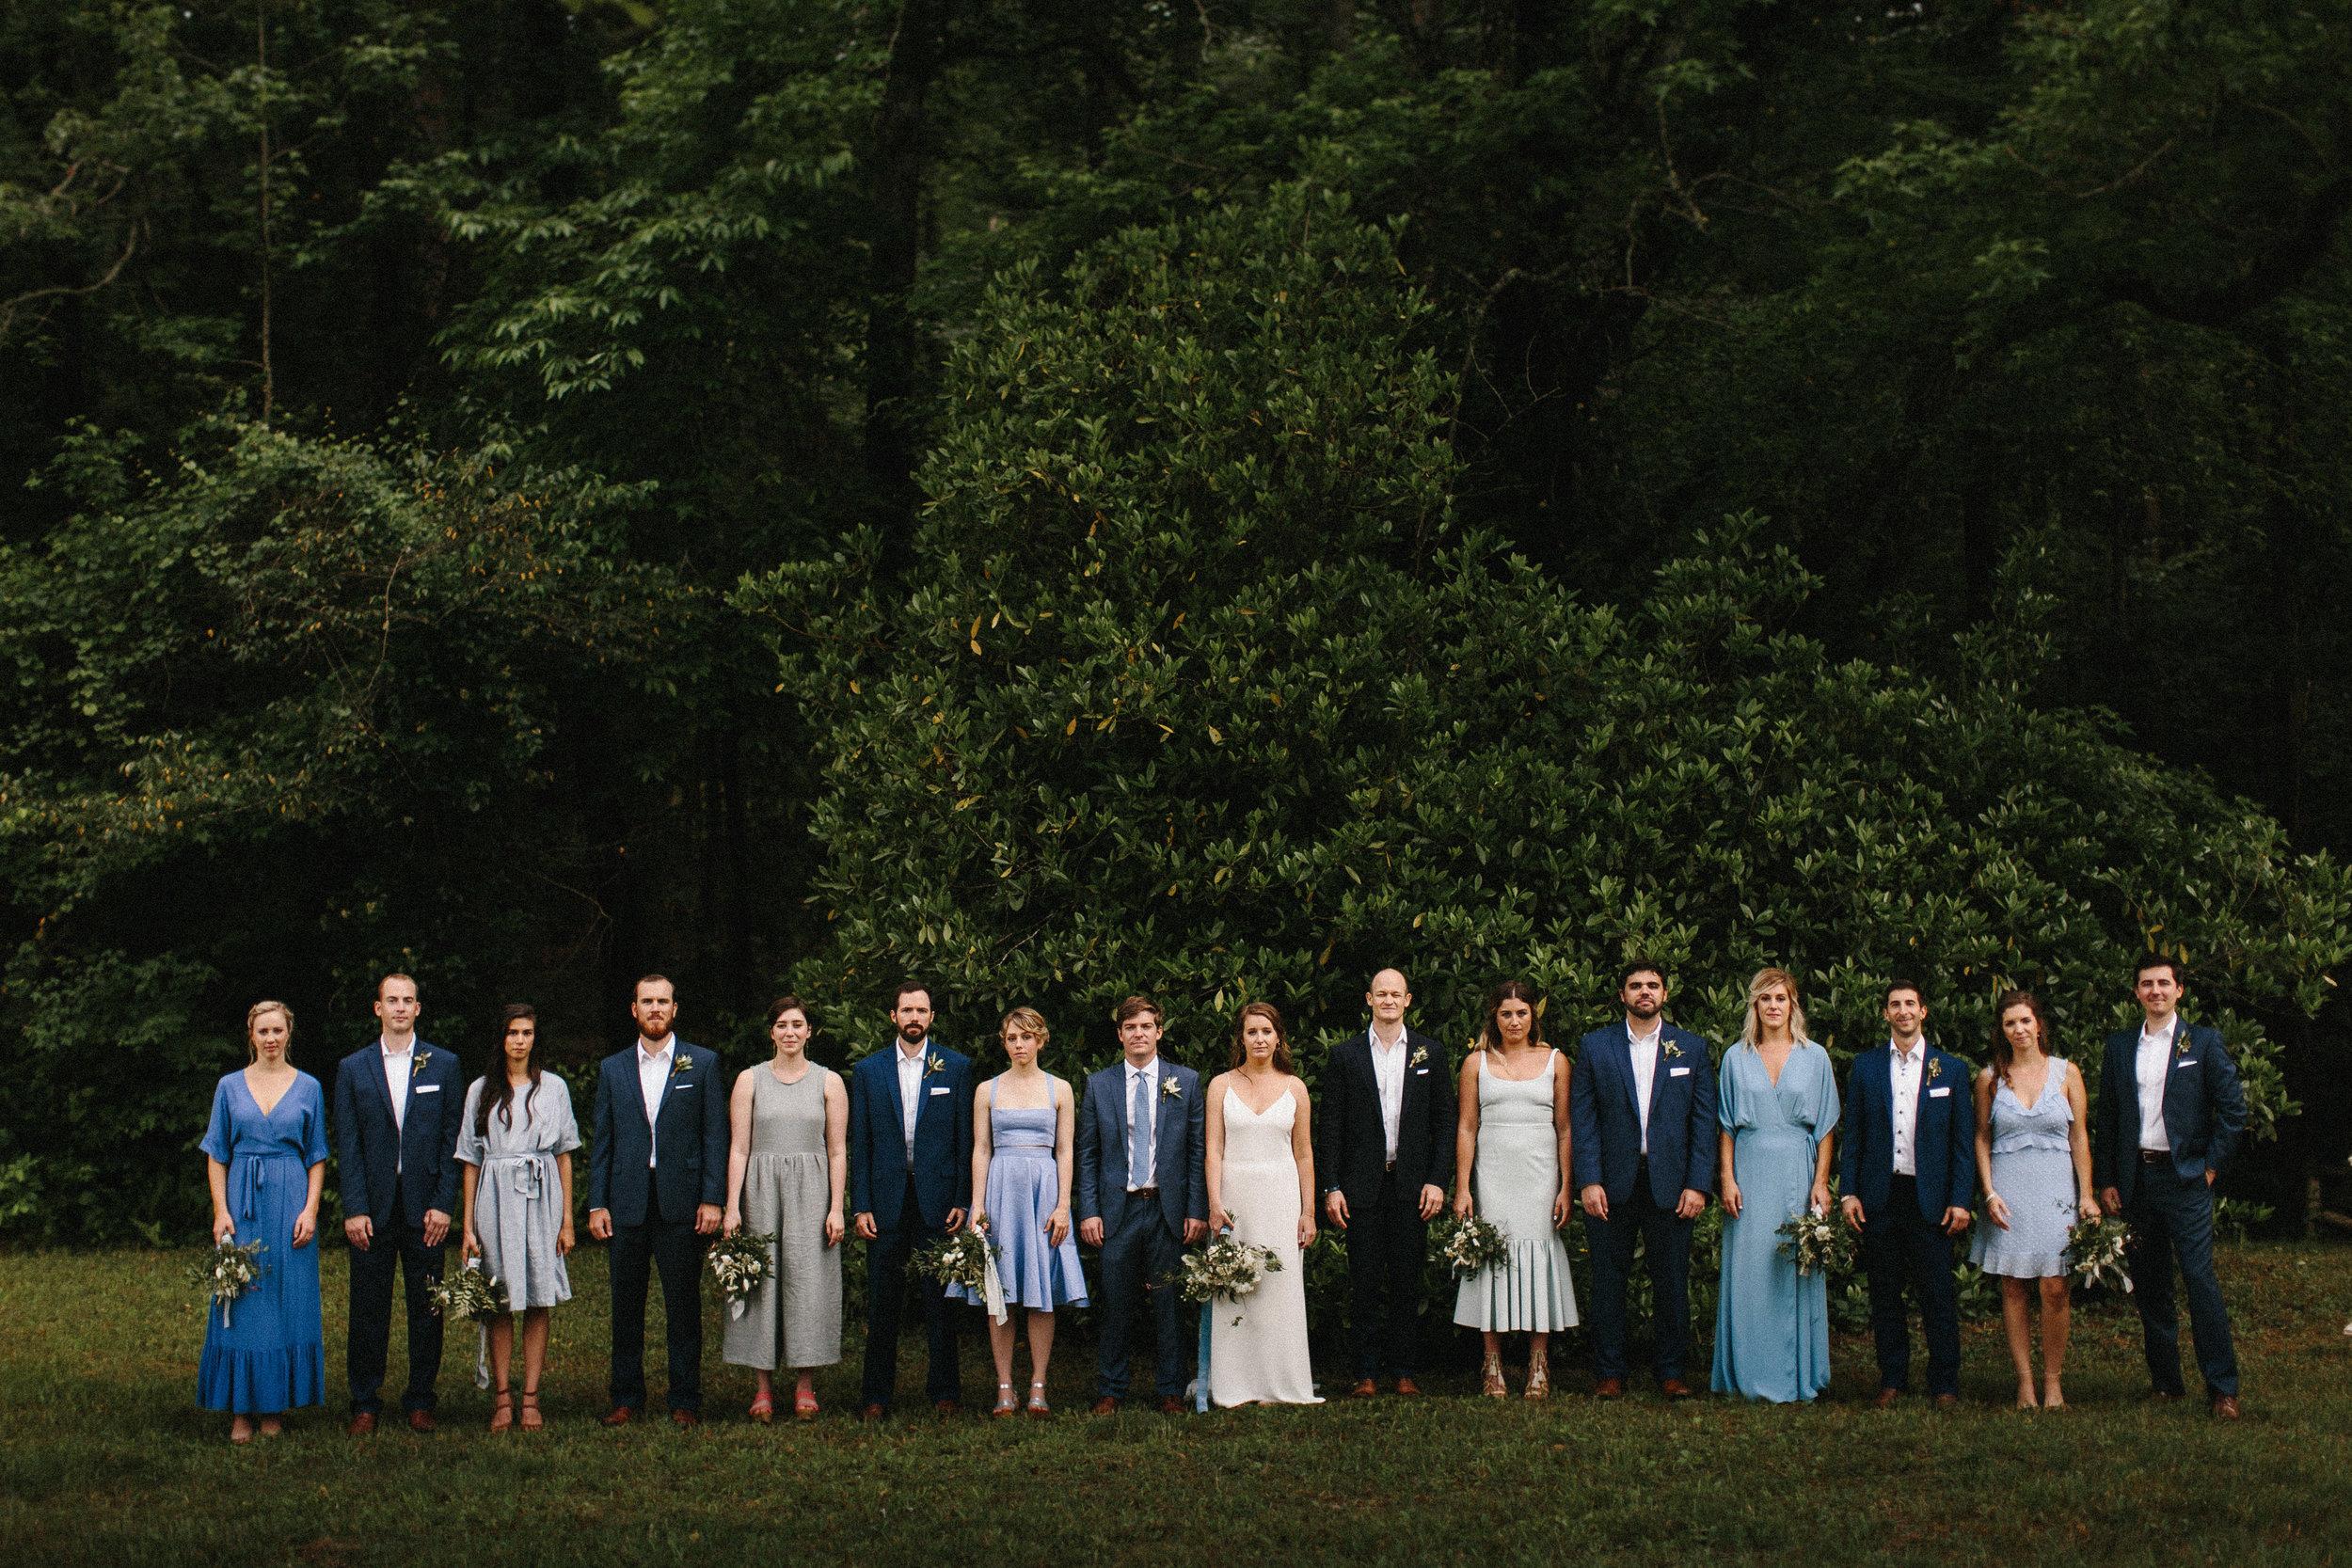 glen_ella_meadow_creekside_atlanta_wedding_photographers_1584.jpg